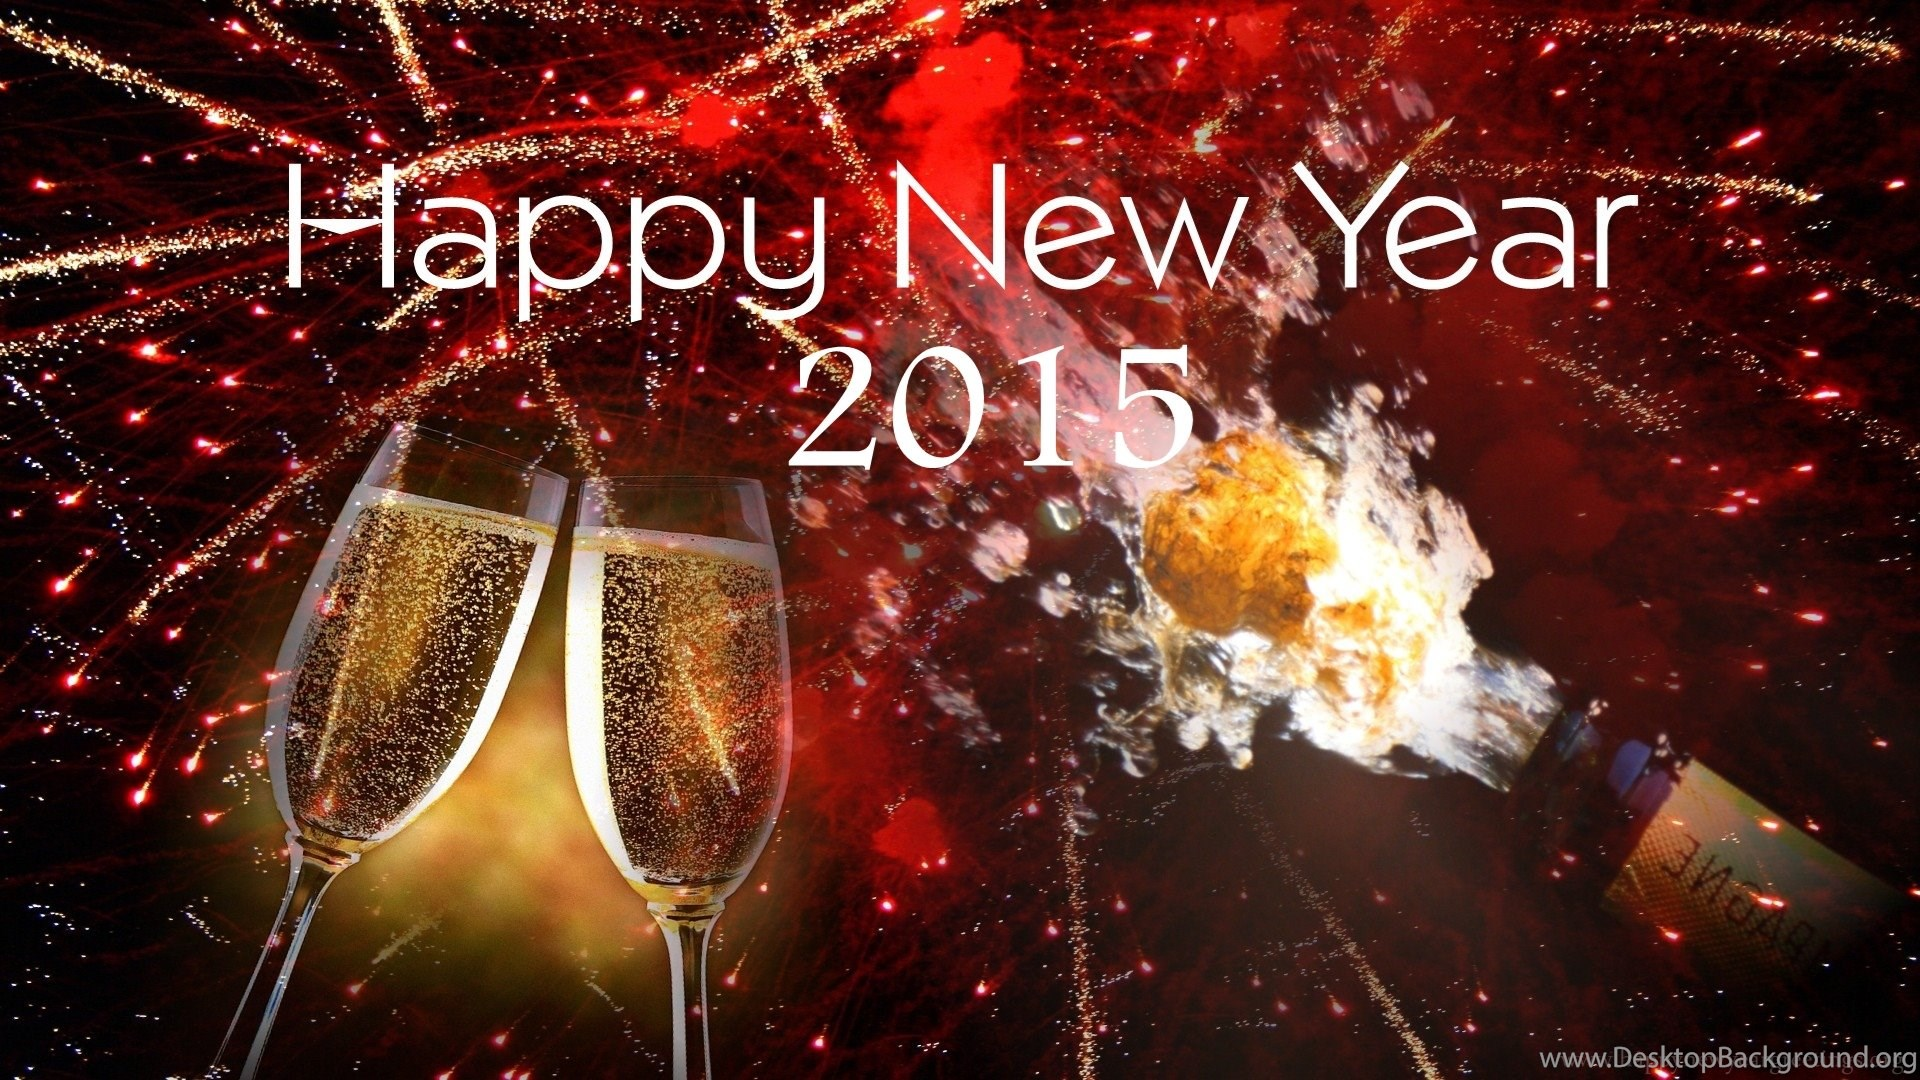 Happy New Year 2015 Free Hd Wallpapers New Year Greetings Desktop